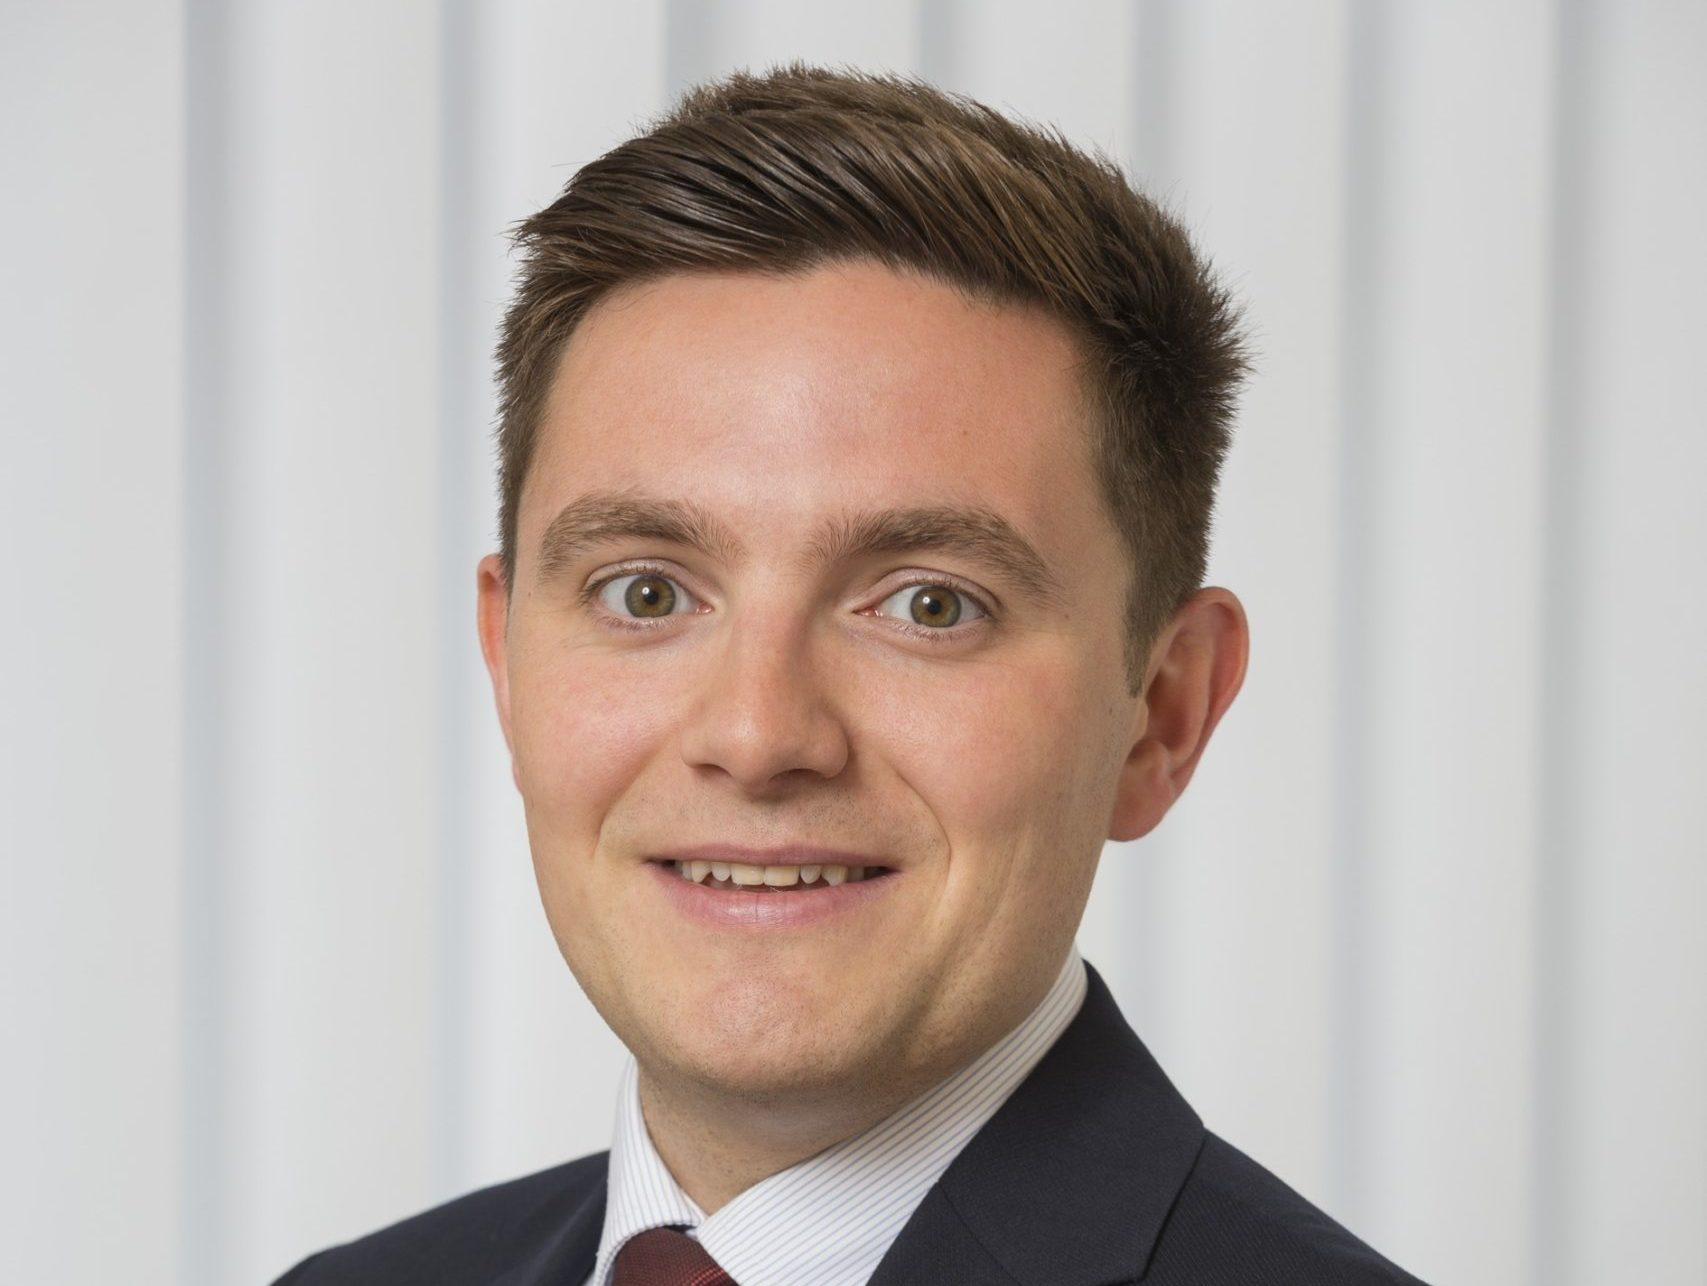 John Dargie has been appointed legal director at Blackadders LLP.